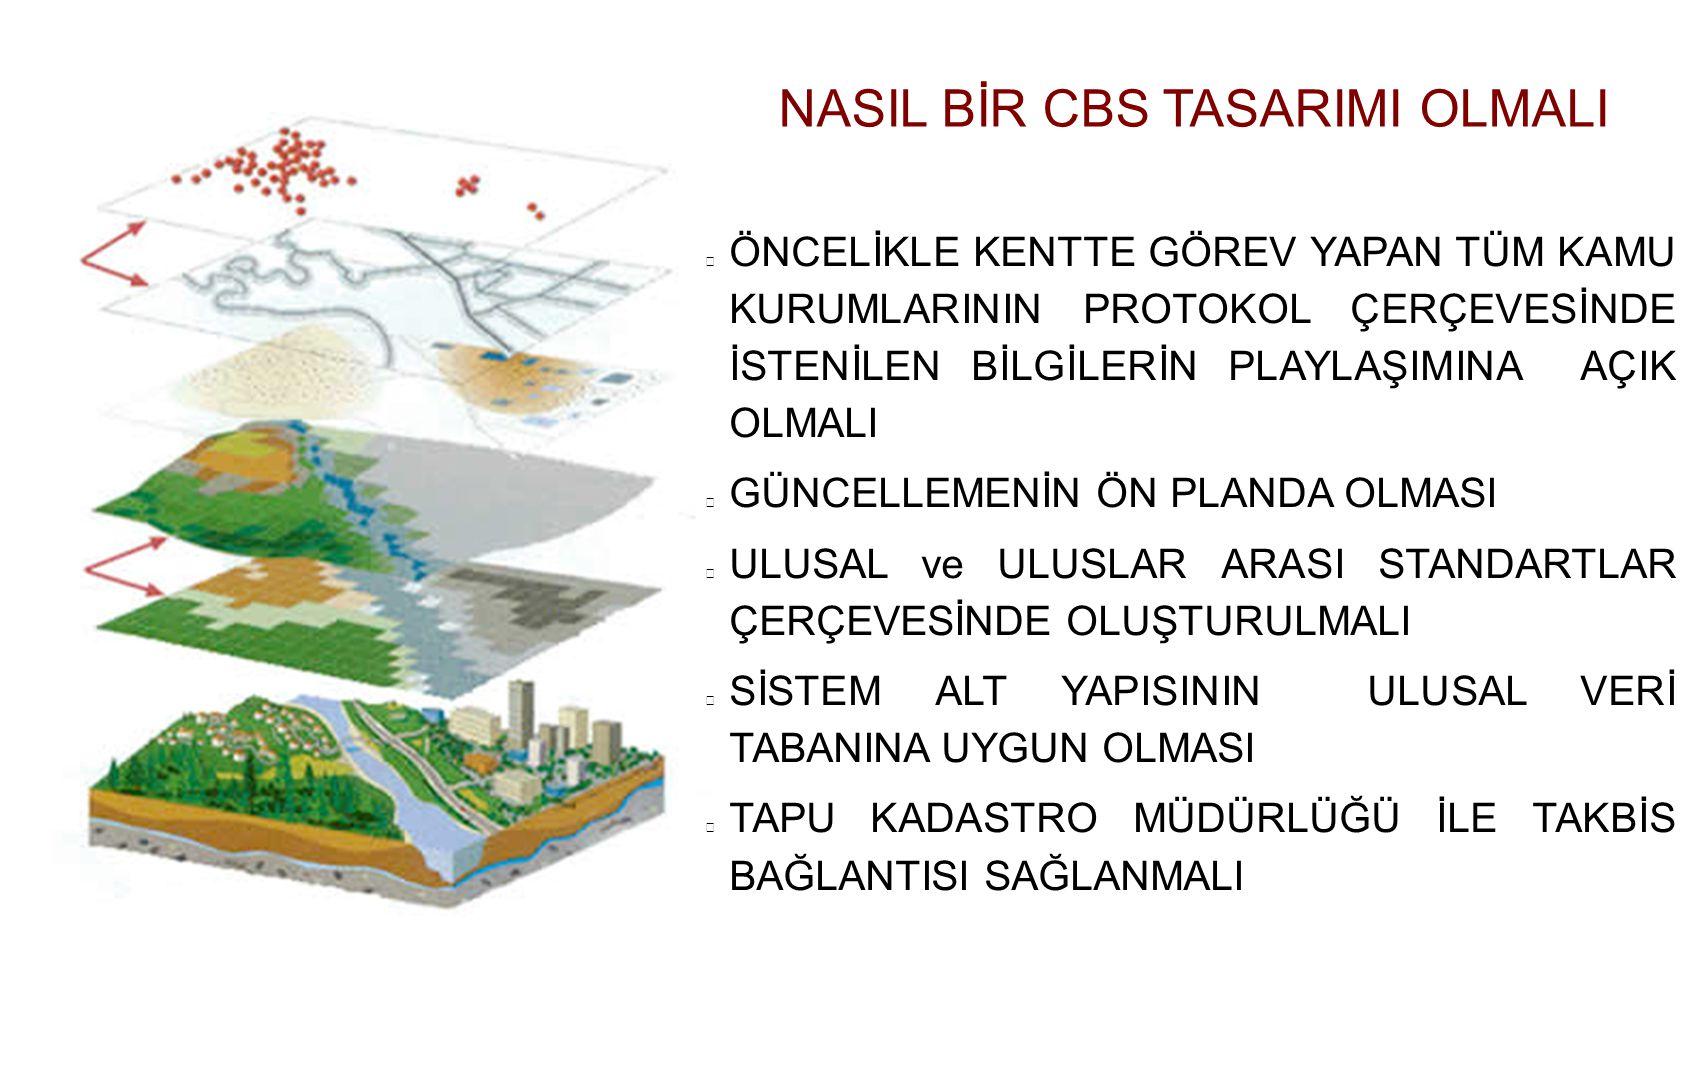 NASIL BİR CBS TASARIMI OLMALI